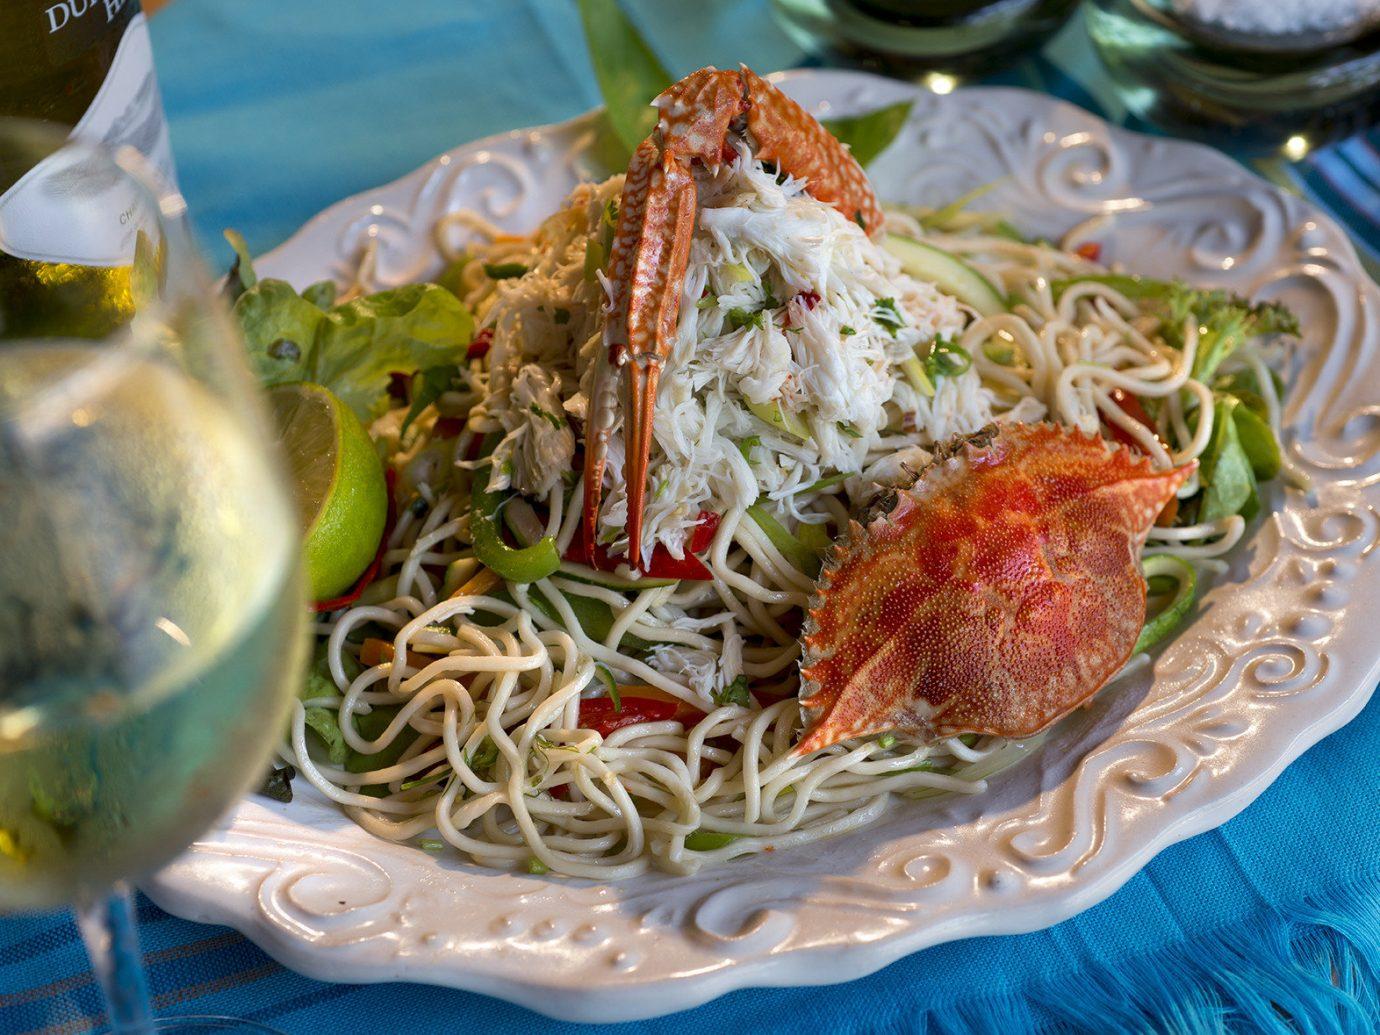 Trip Ideas food dish plate cuisine spaghetti asian food noodle produce thai food southeast asian food Seafood meal